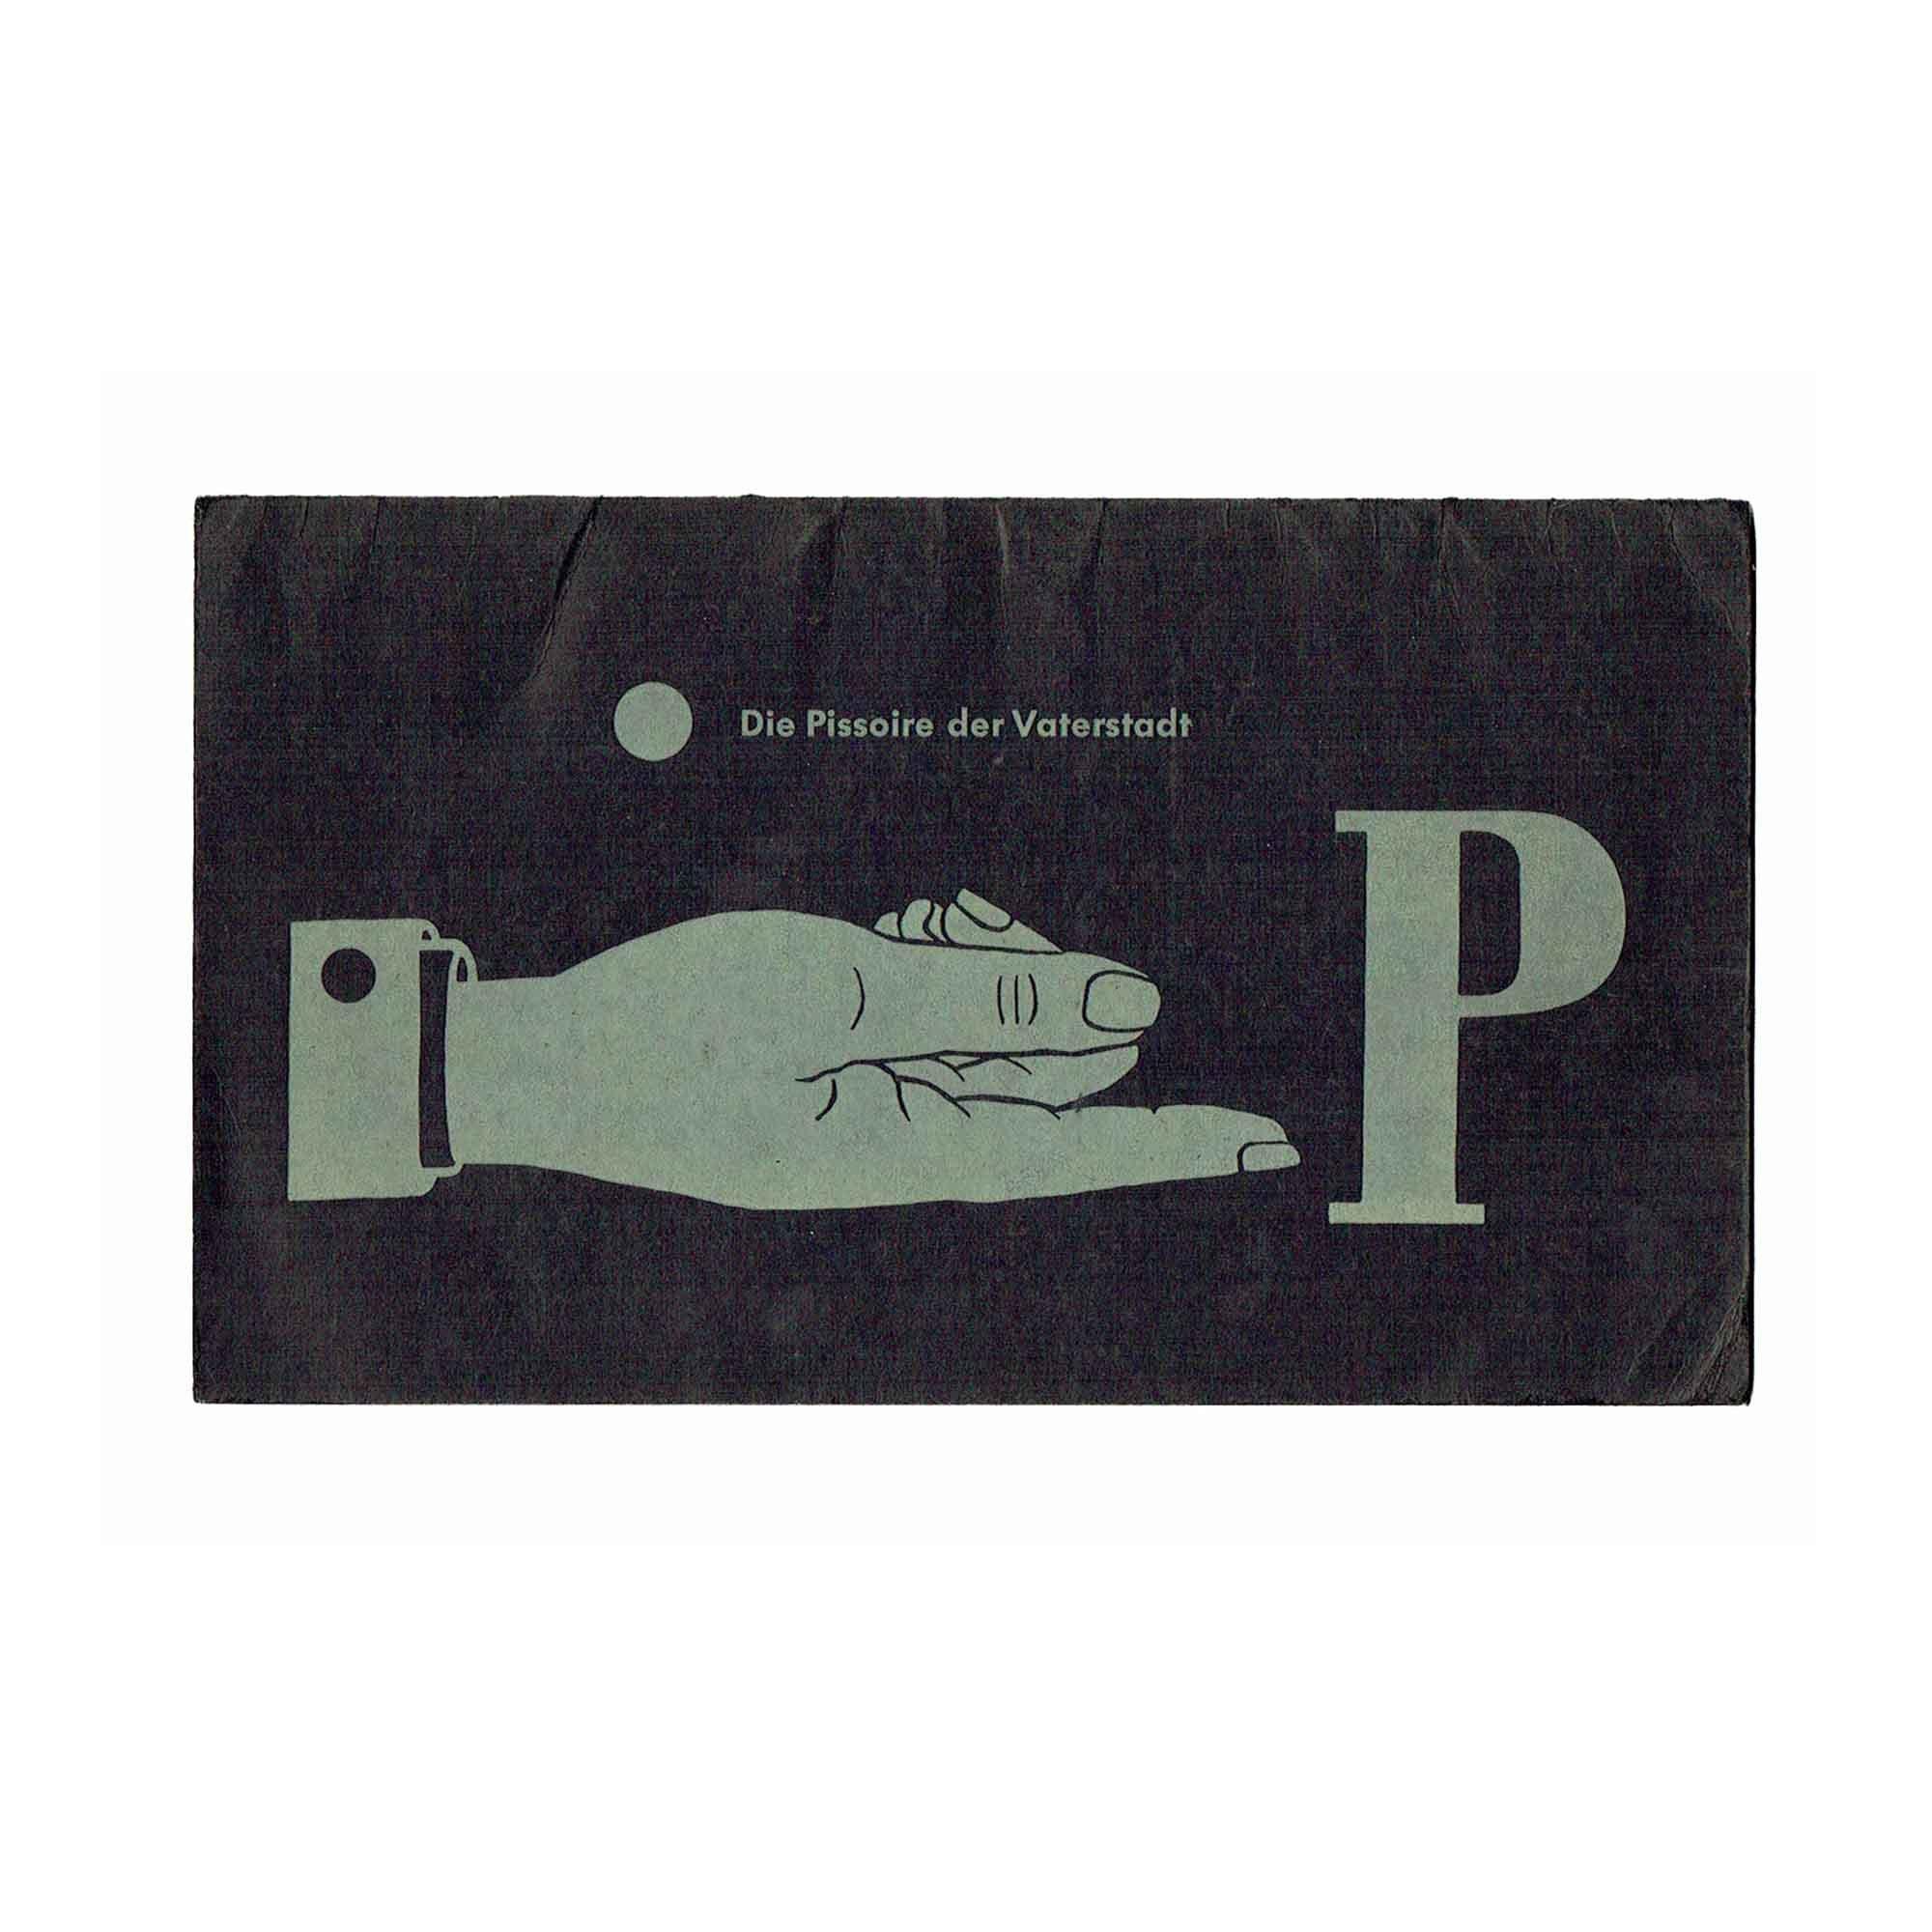 5367 Langenbacher Pissoire Reutlingen 1957 frei N